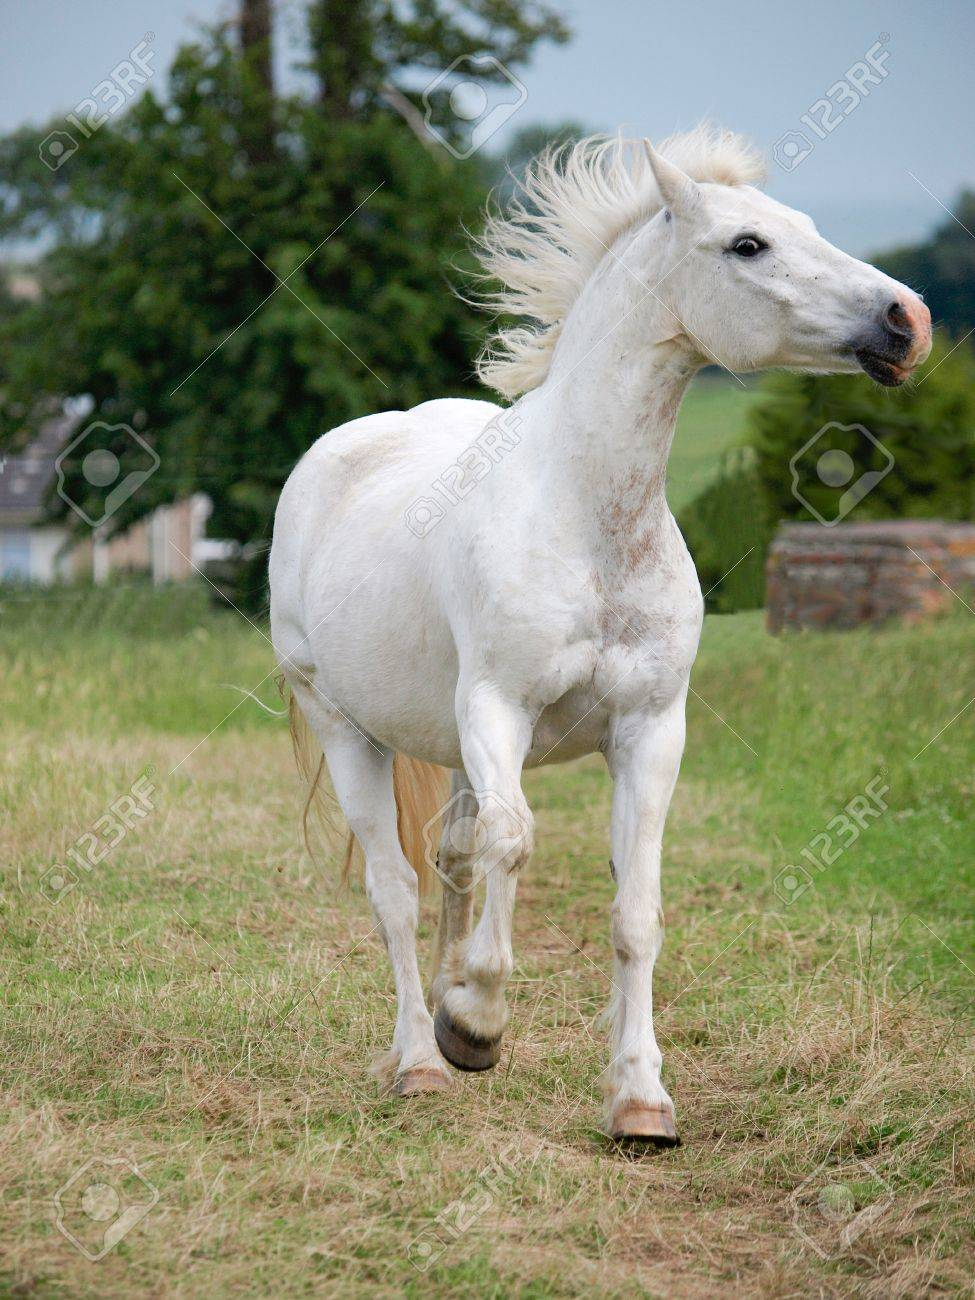 A grey horse runs towards the camera Stock Photo - 16076961